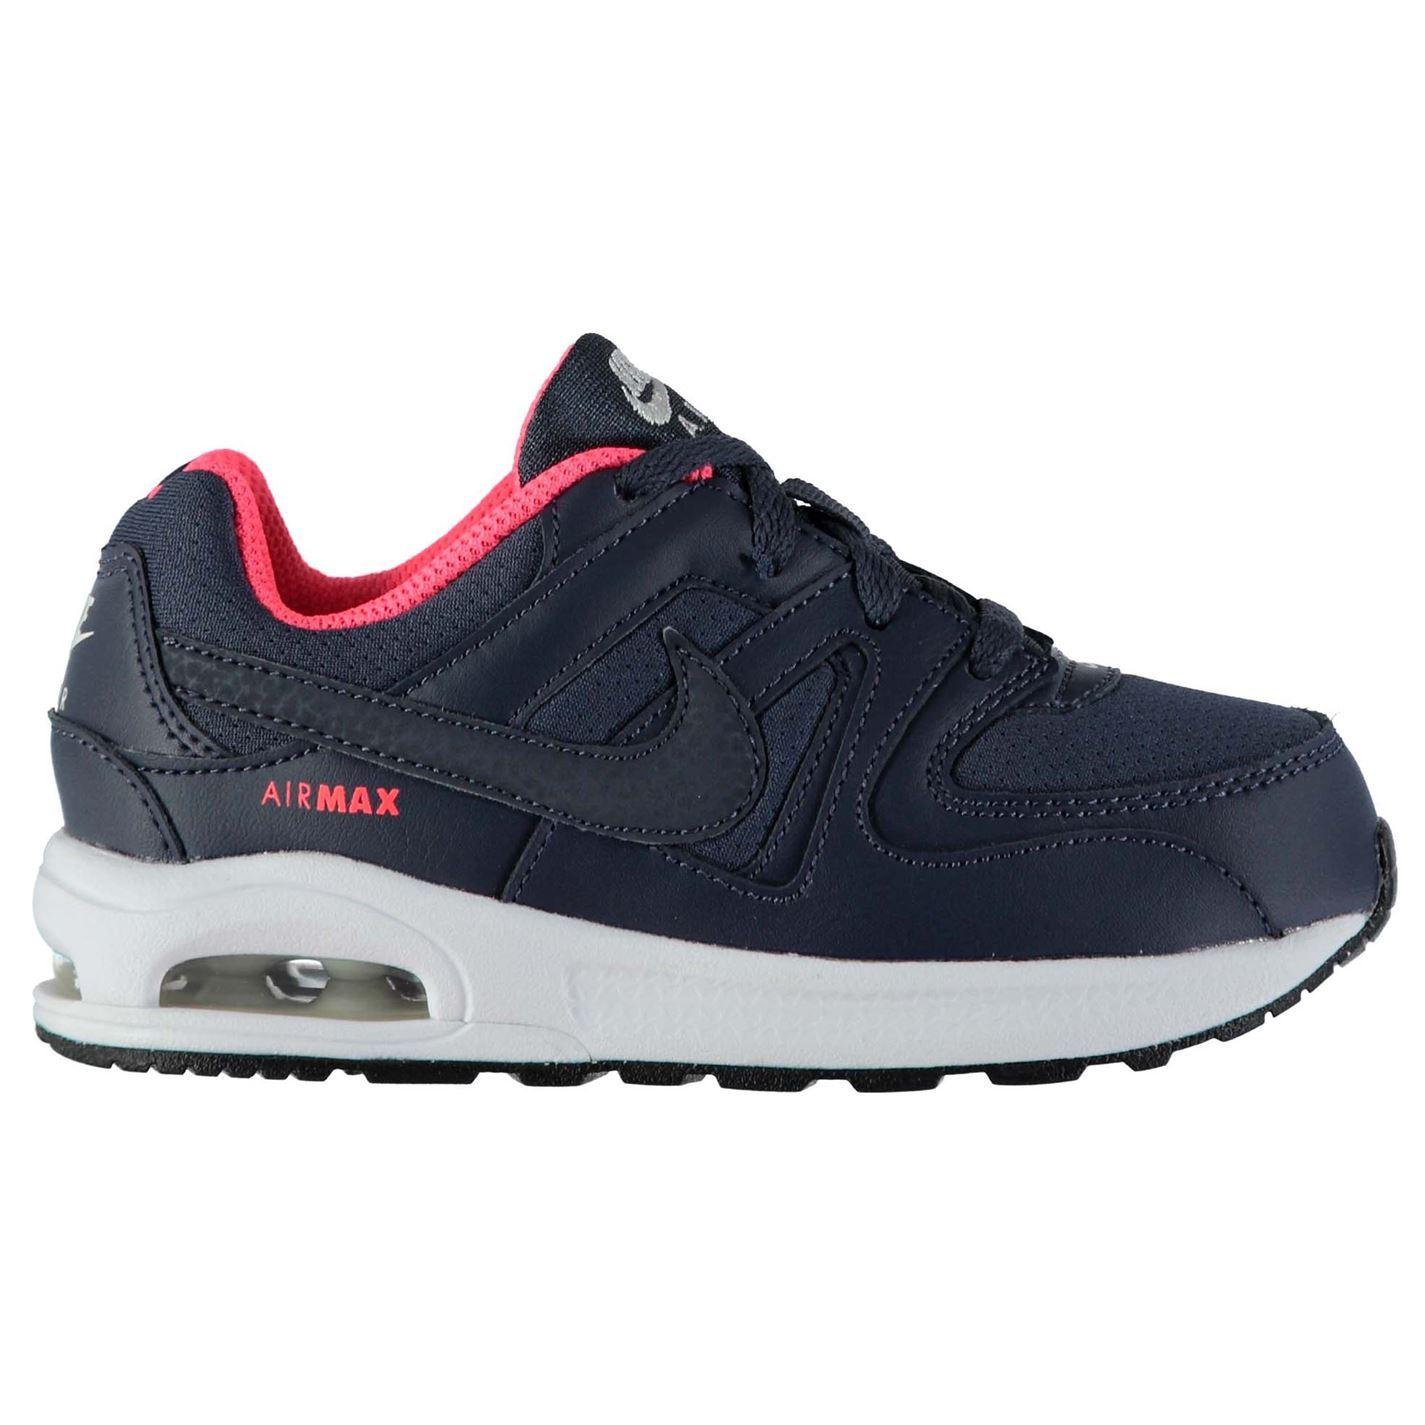 best service 8b53e 78ad4 ... Nike Air Max Command Junior filles bleublanc chaussures chaussures ...